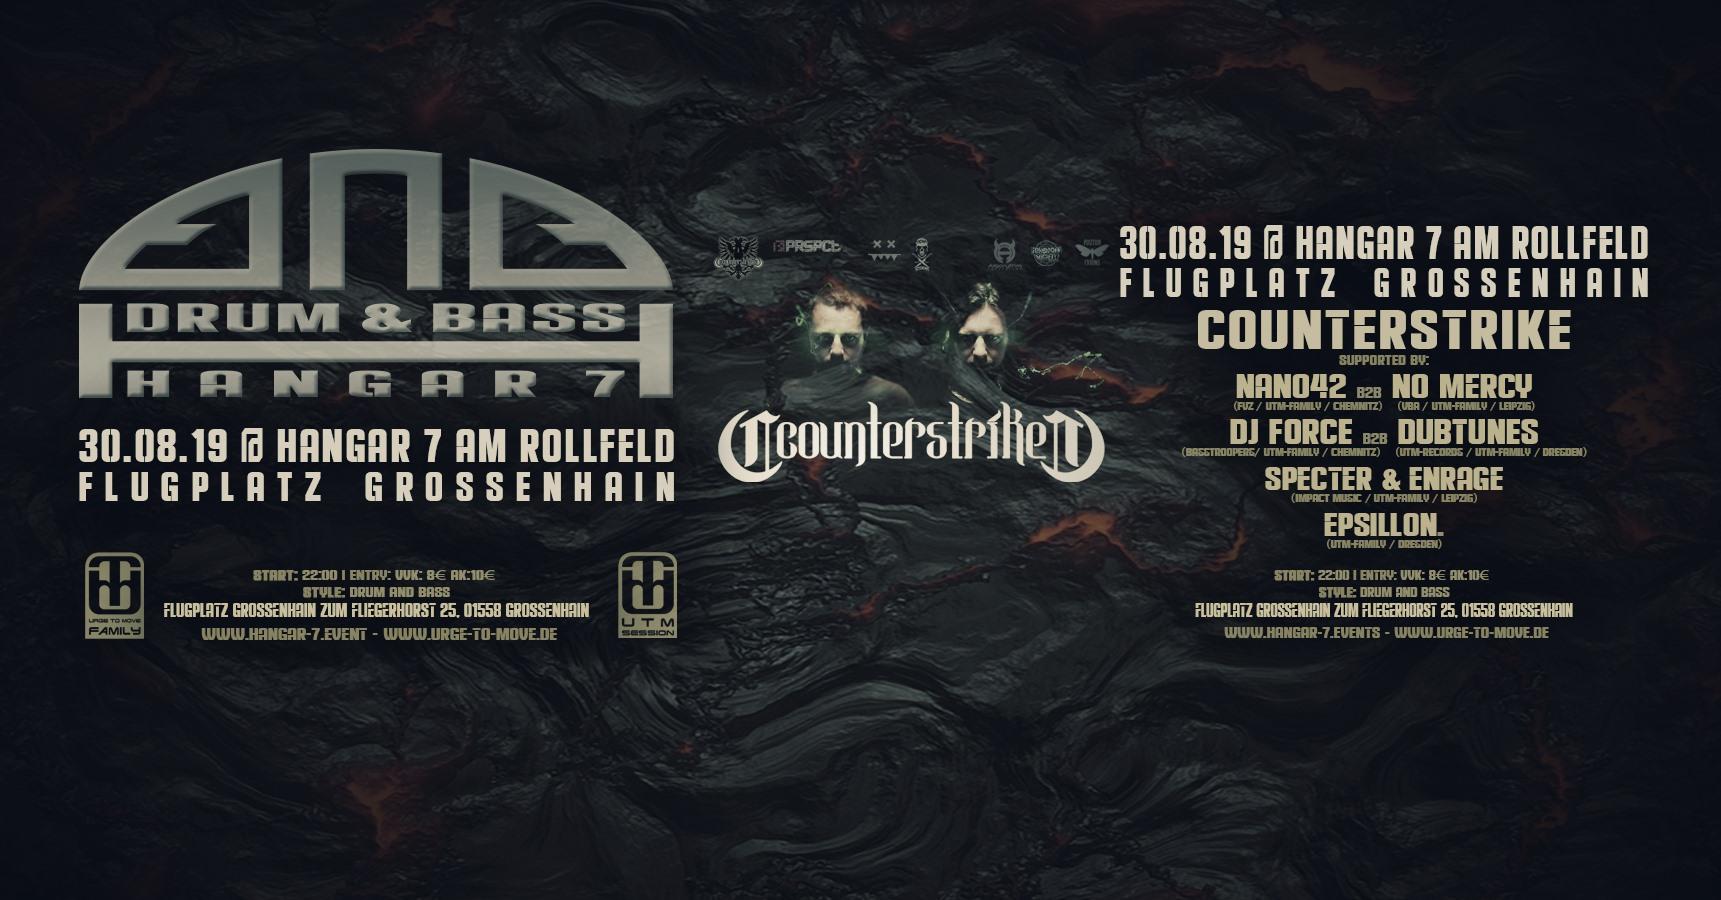 Drum & Bass – Hangar 7 with Counterstrike + UTM-Family